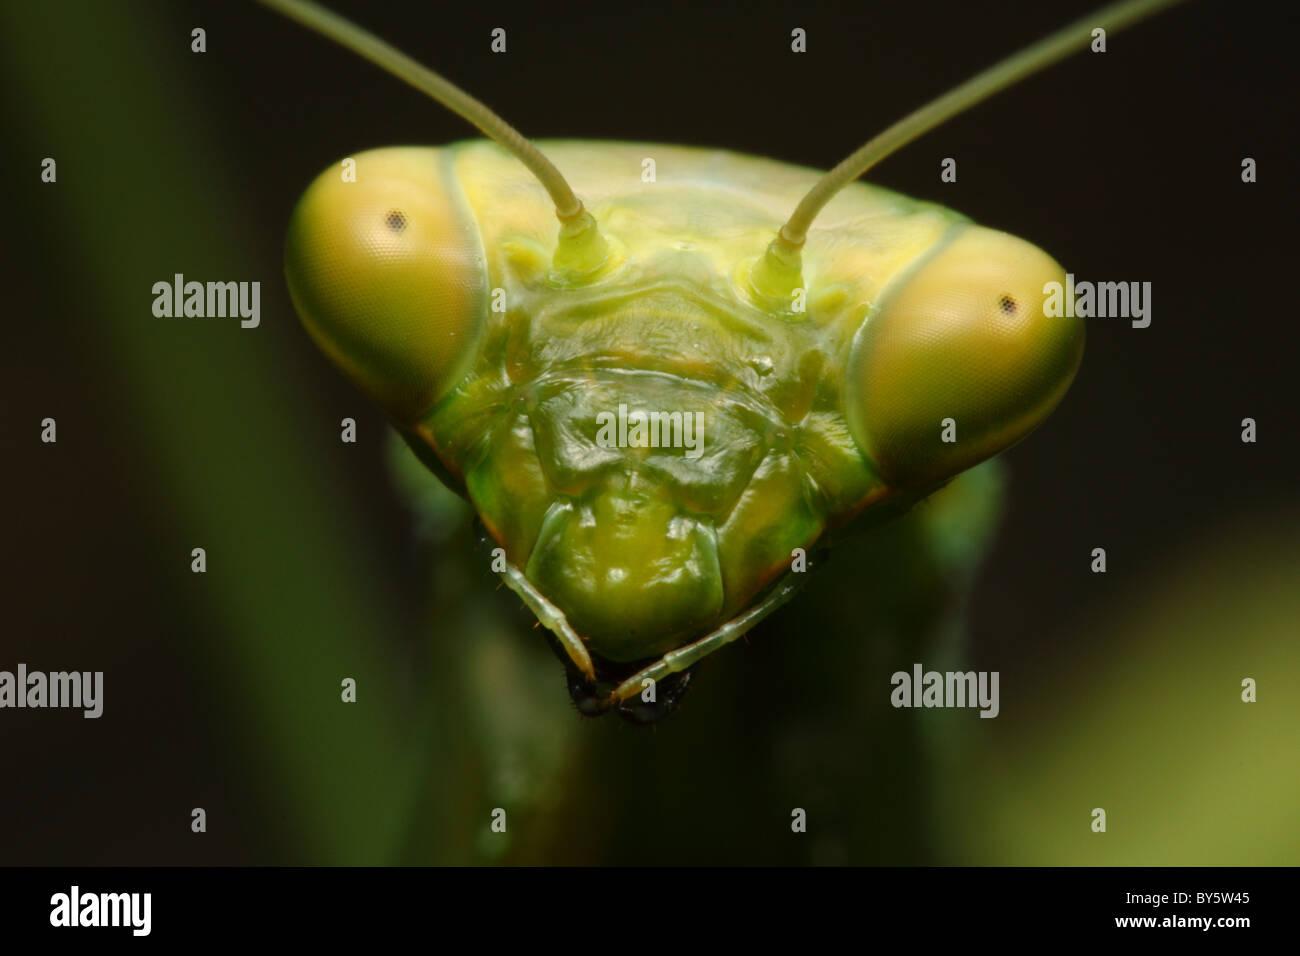 Portrait of a praying mantis at 2x sensor size - Stock Image